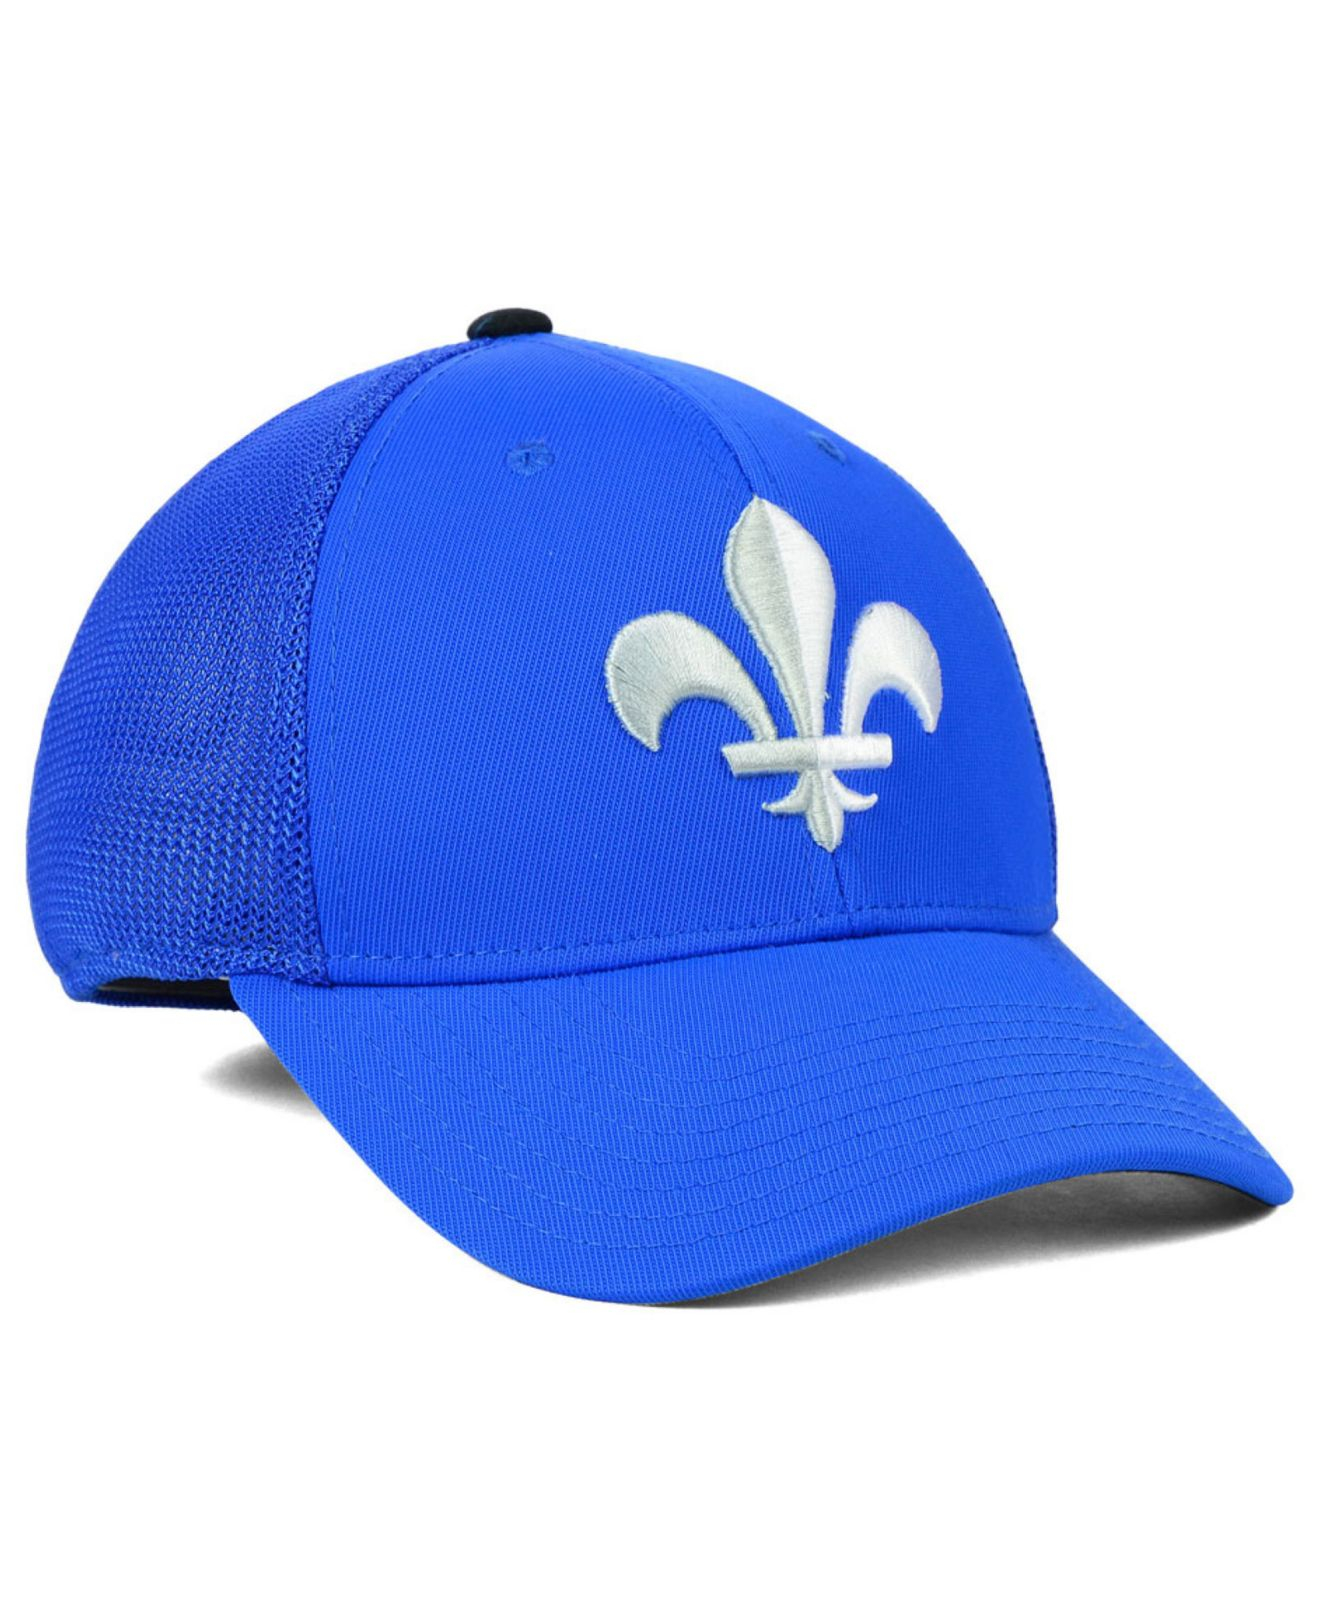 promo code 751f8 8d13e Lyst - adidas Originals Montreal Impact Stretch-fit Cap in Blue for Men